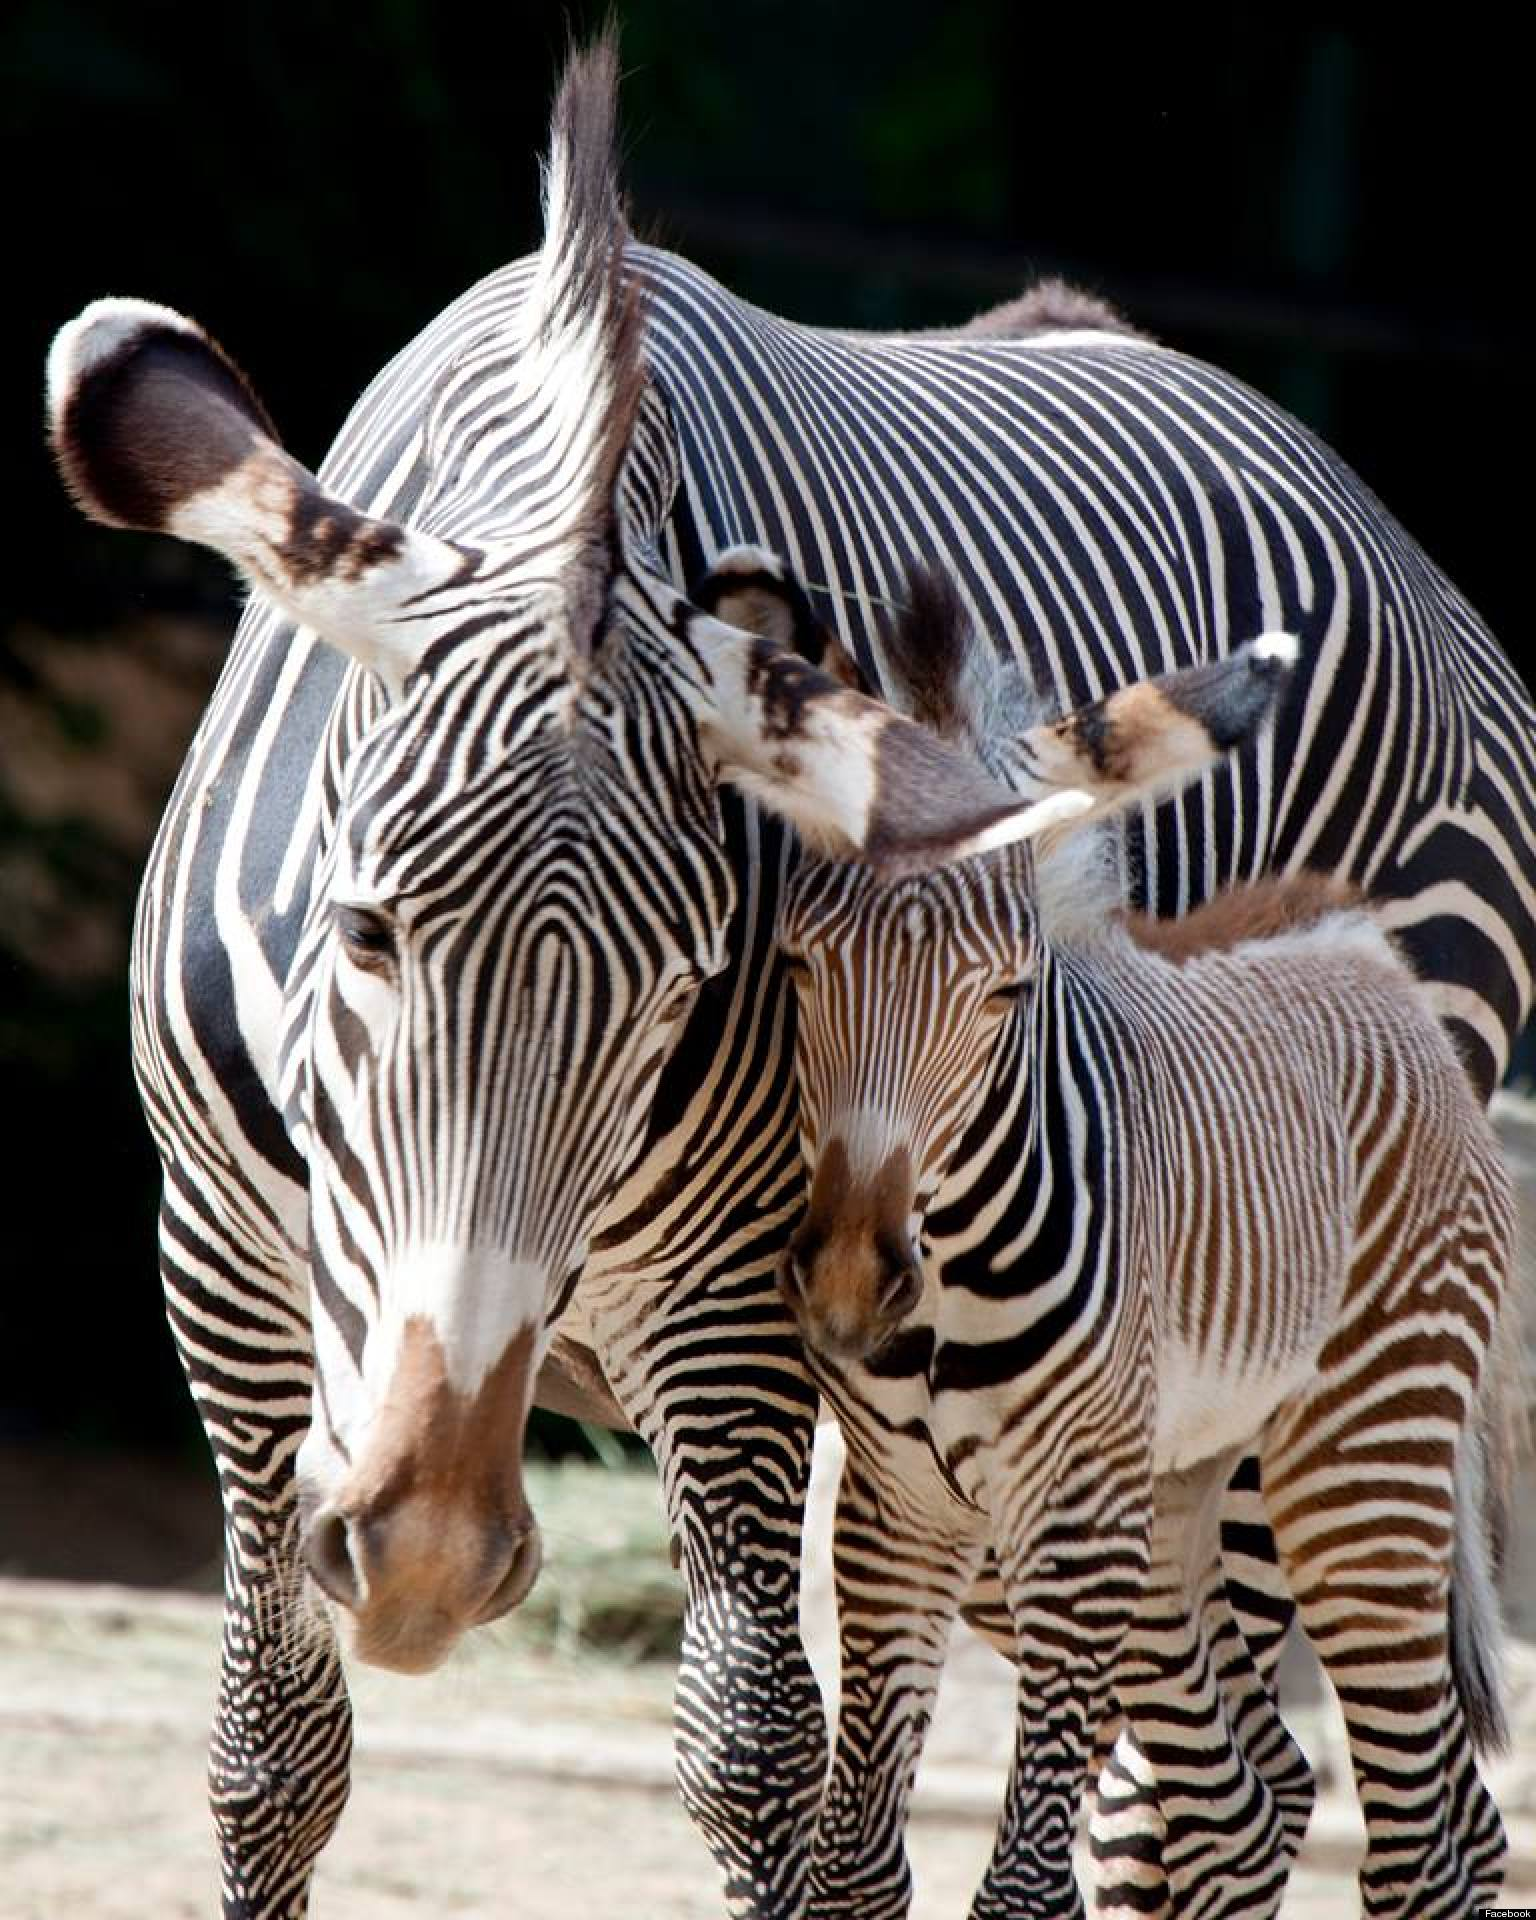 Denver Zoo Welcomes Birth Of Endangered Grevy's Zebra Foal